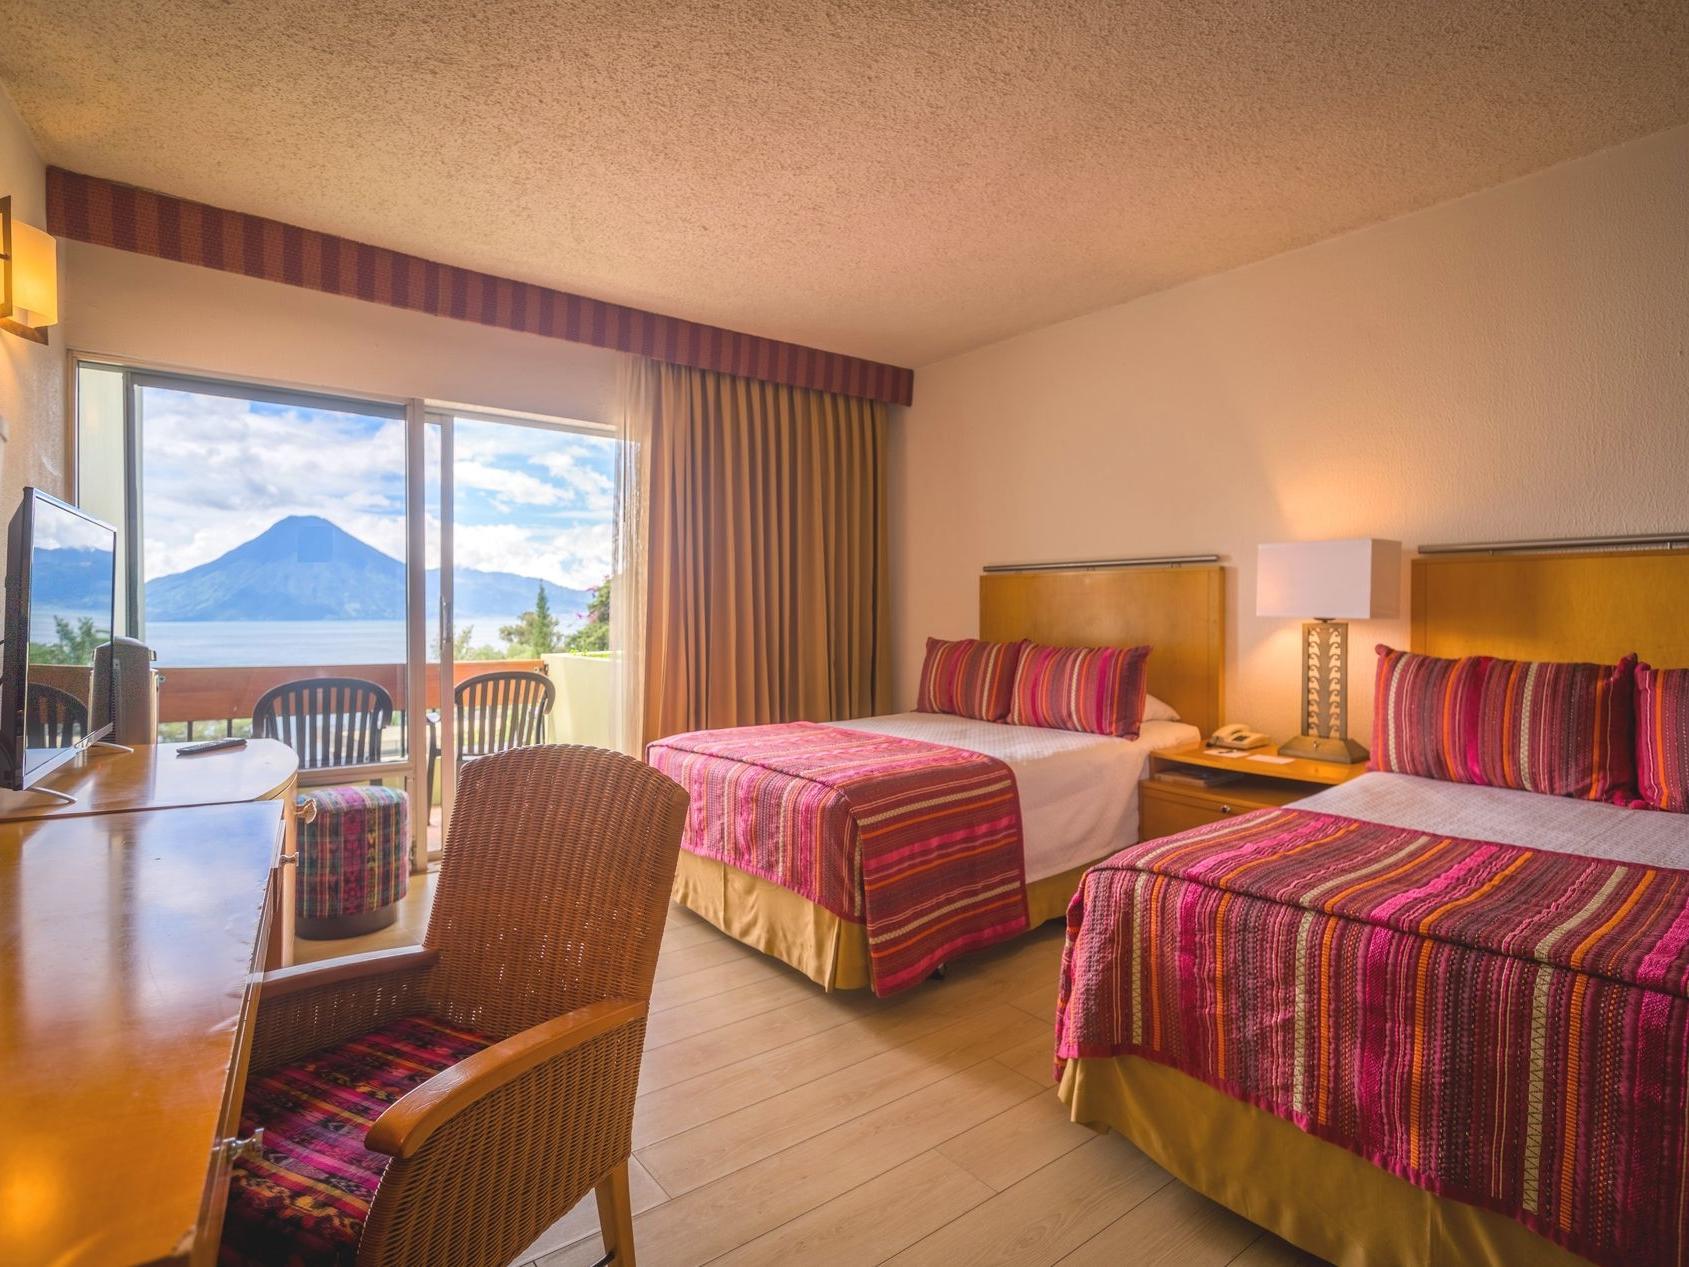 Porta Hotel Del Lago – Boutique Hotel in Panajachel Guatemala